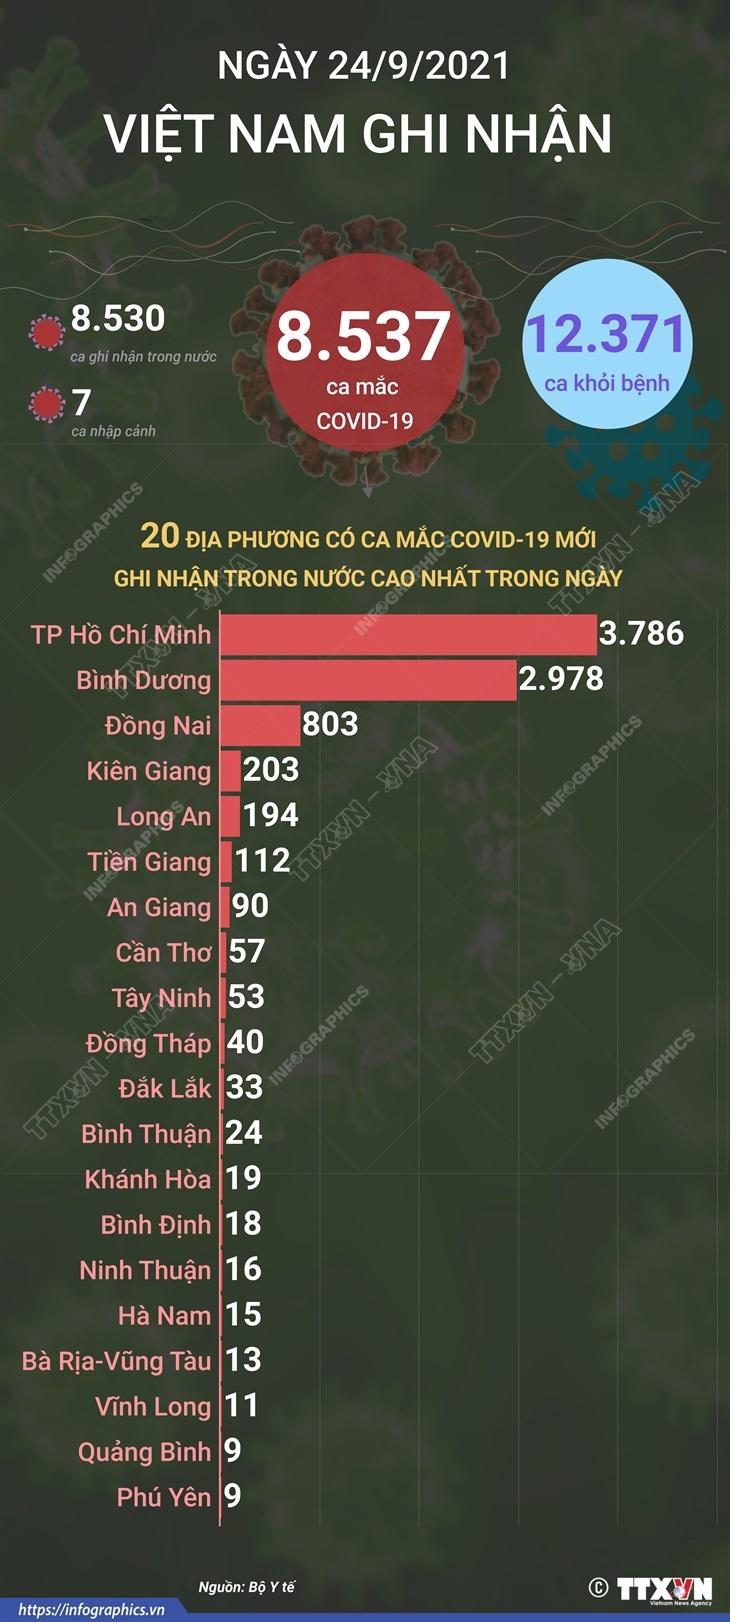 [Infographics] Them 8.537 ca mac COVID-19 va 12.371 nguoi khoi benh hinh anh 1